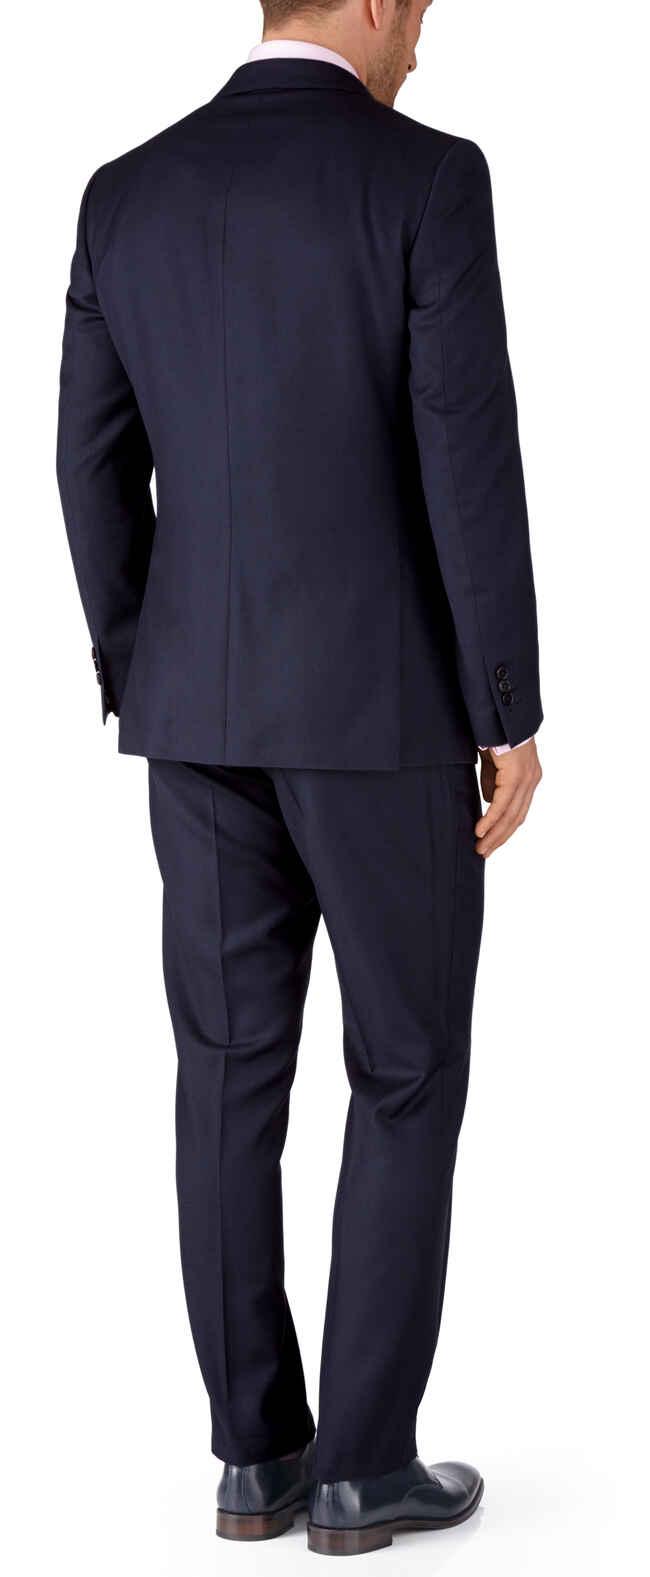 Ink blue slim fit birdseye travel suit